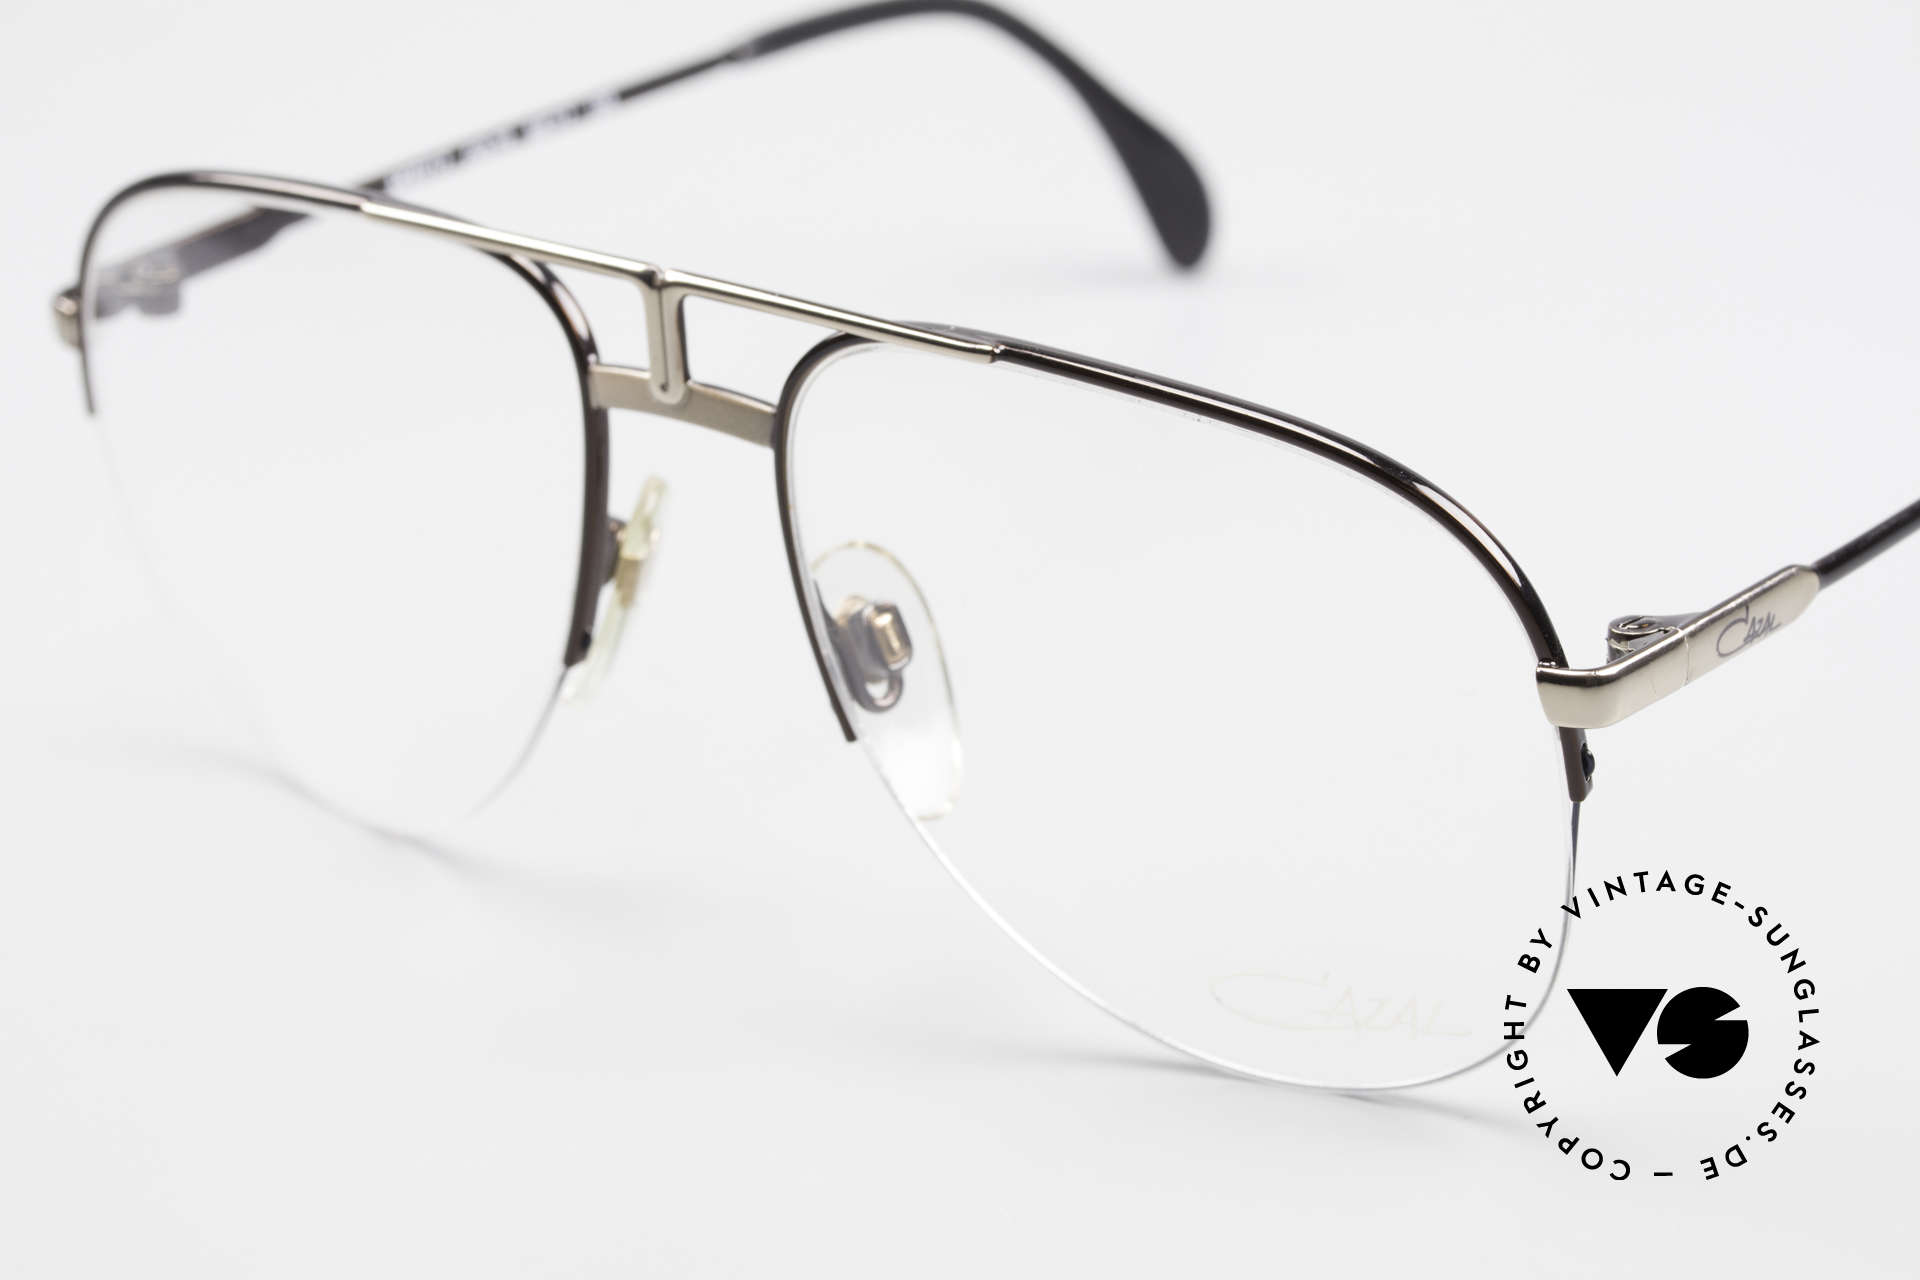 Cazal 717 Old 80's Glasses Semi Rimless, unworn (like all our vintage frames by Cazal), Made for Men